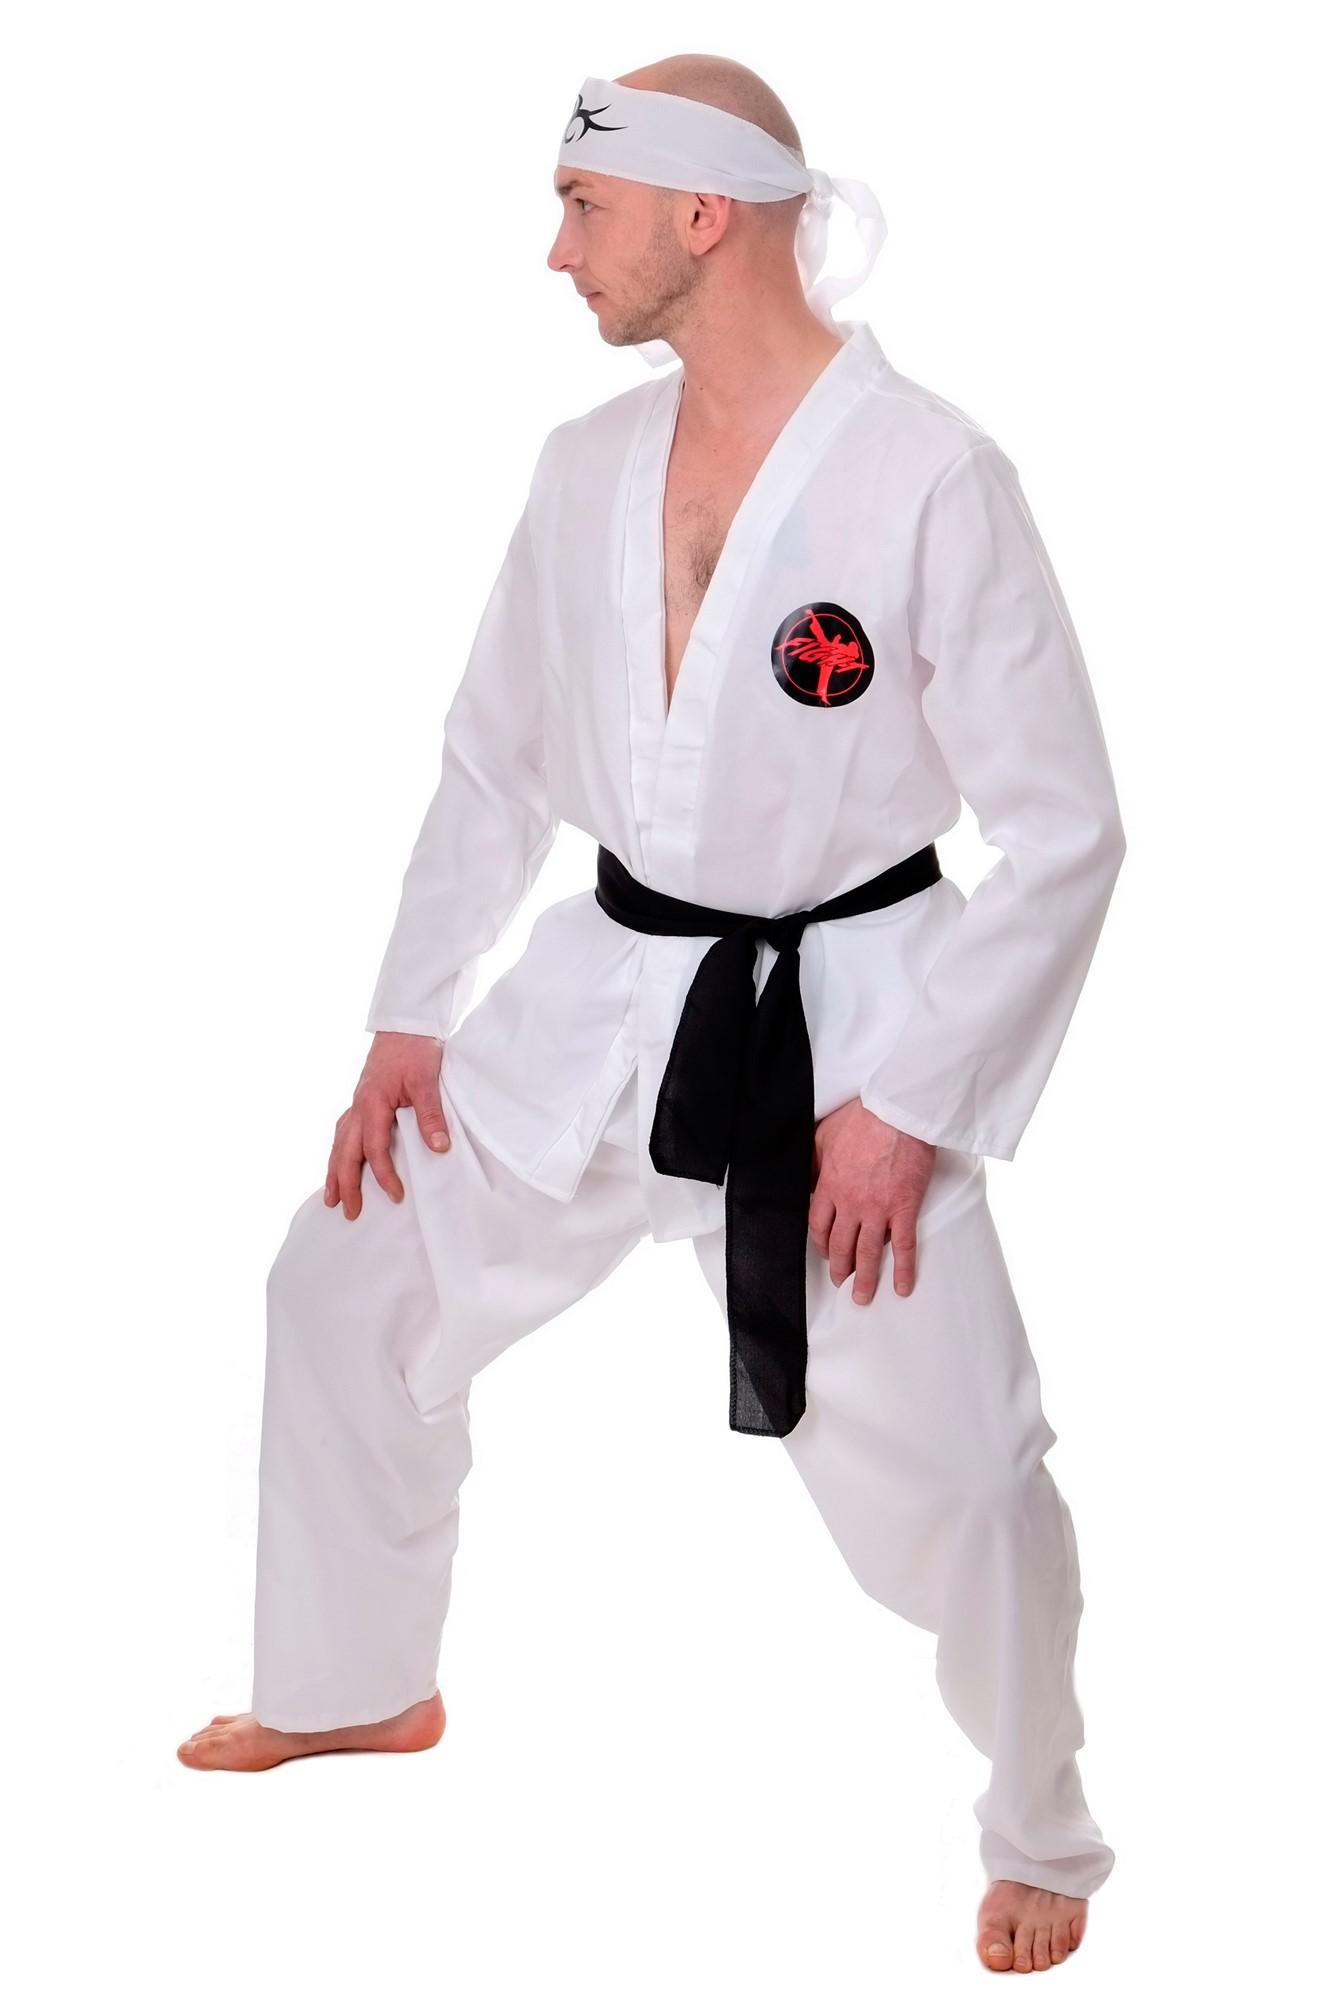 dress me up kost m herren herrenkost m 80er karate ninja kungfu action gr s m kaufen bei vk. Black Bedroom Furniture Sets. Home Design Ideas